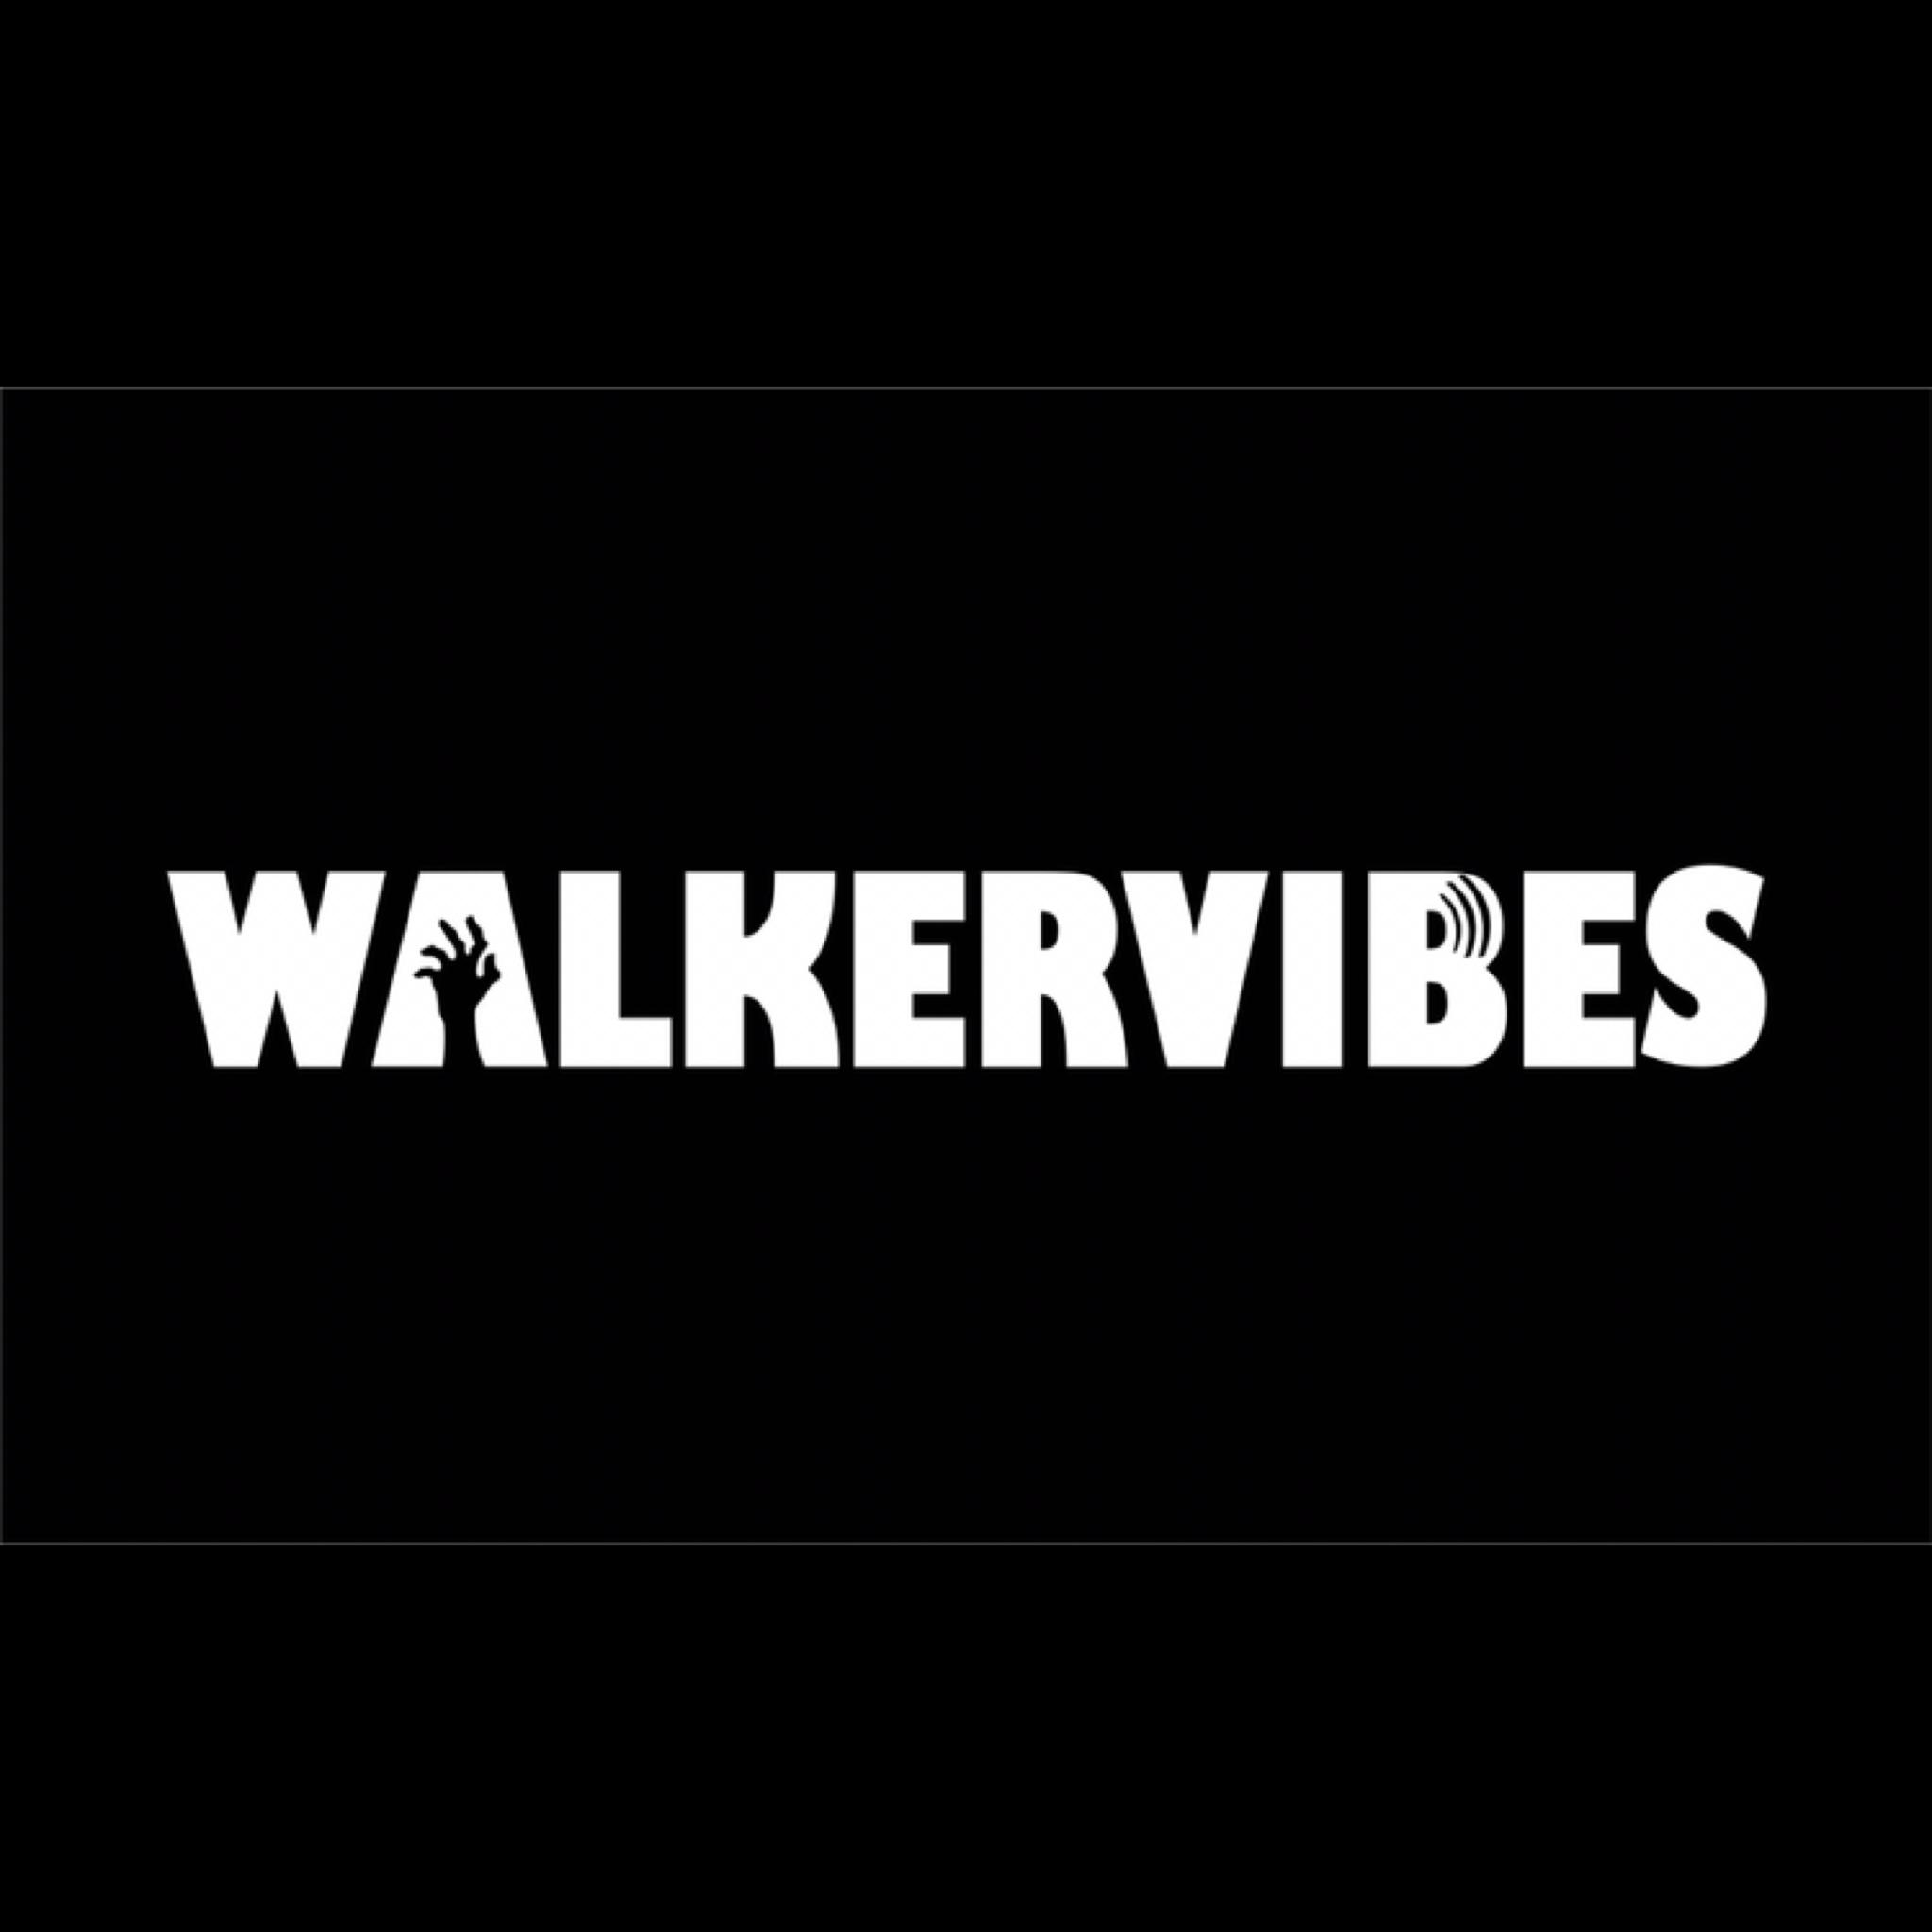 WalkerVibes's tracks